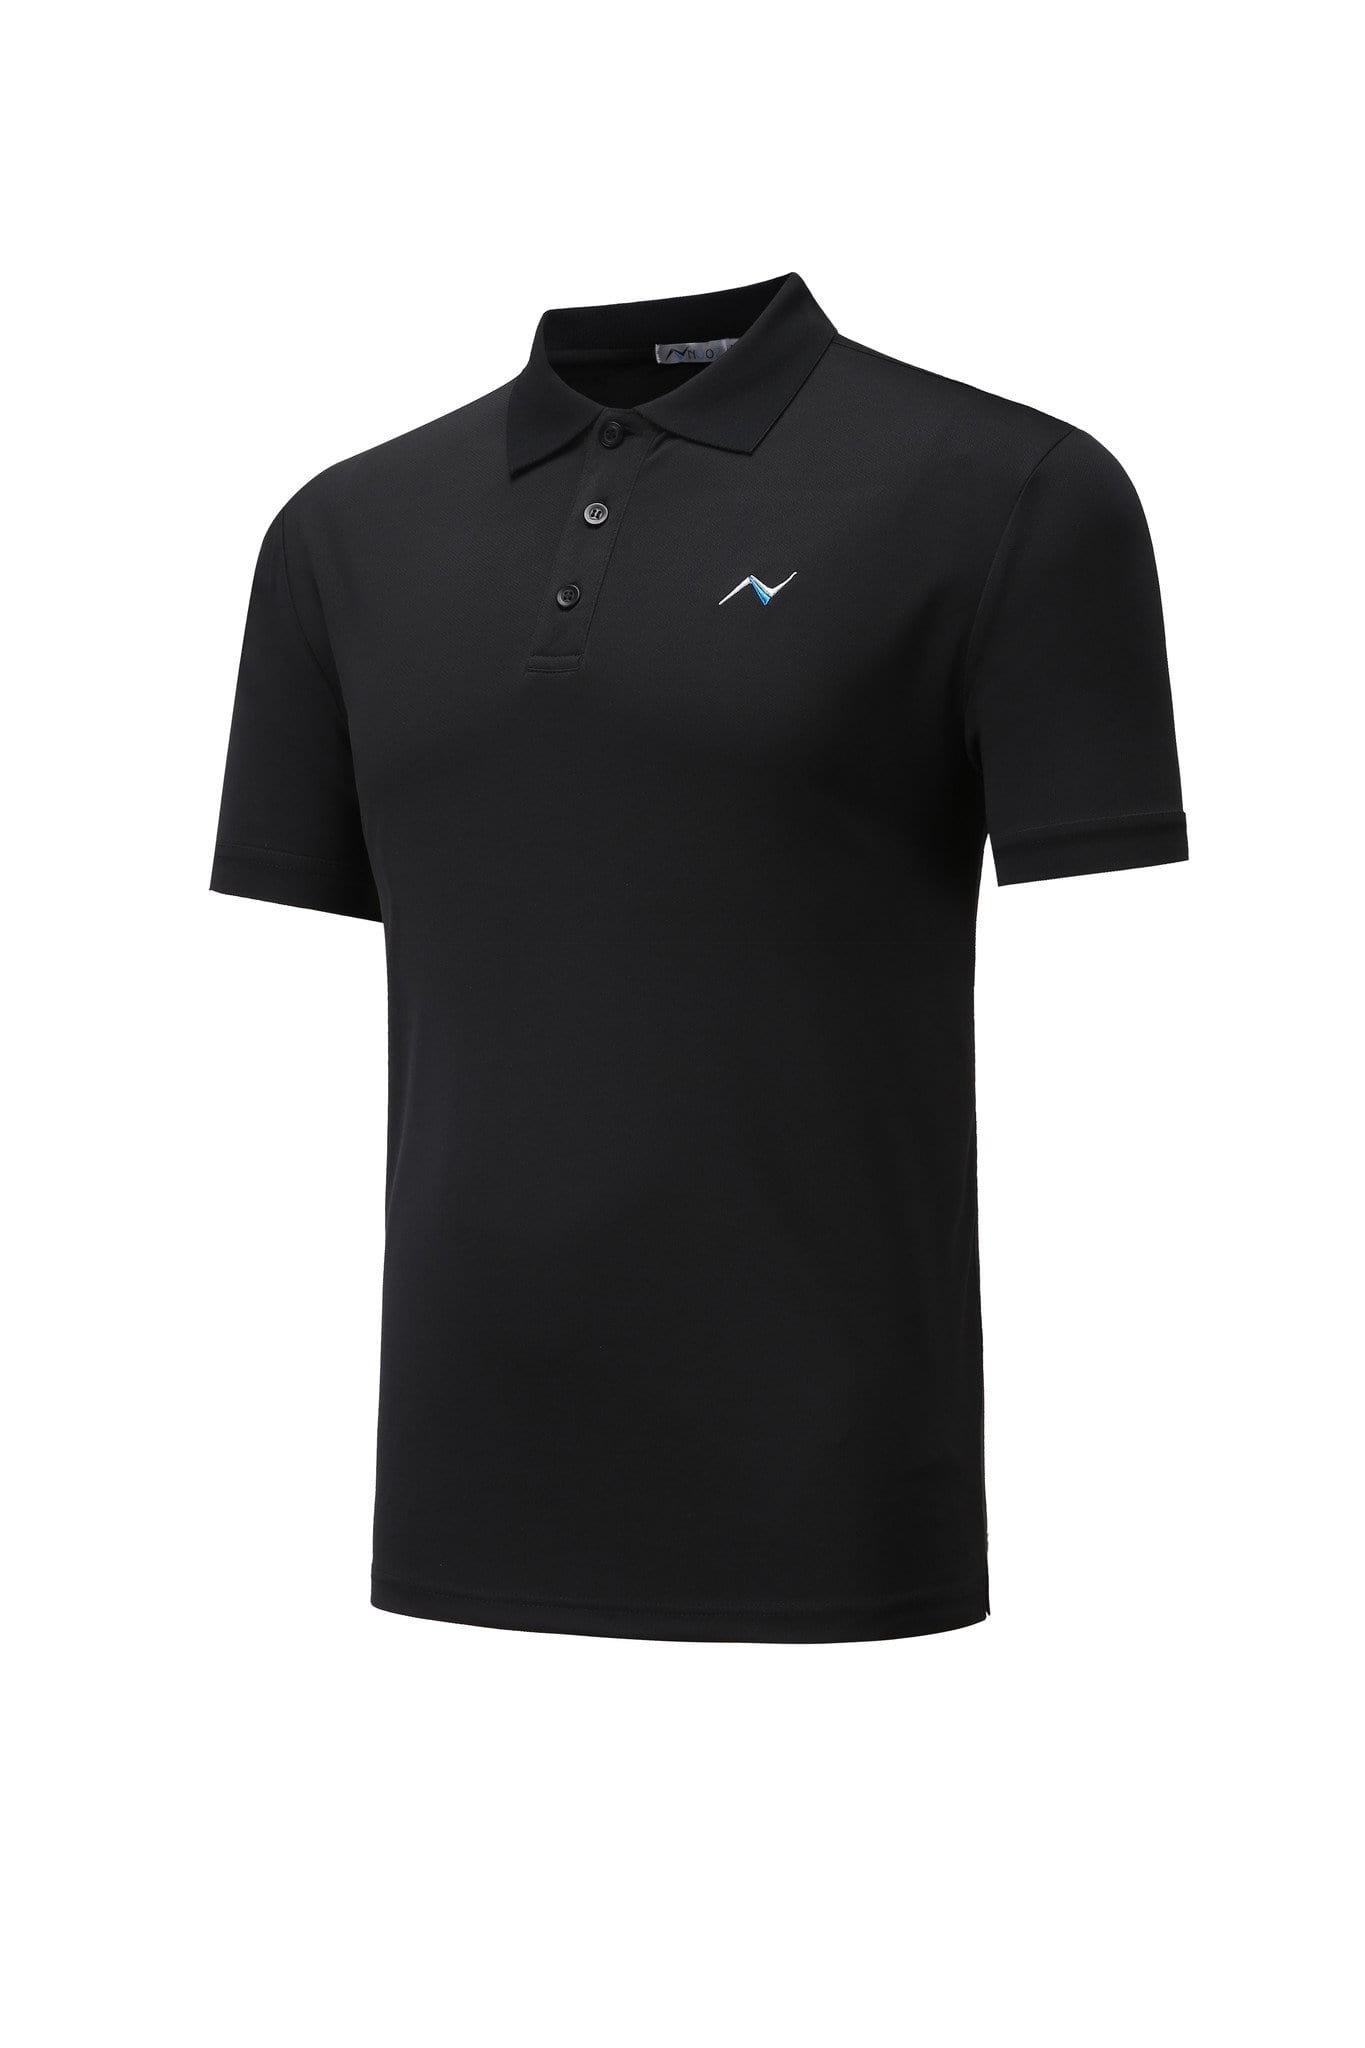 9efb692d109b5 NOOZ Athletic Fit Short Sleeve Polo Golf Shirt | Products | Golf ...